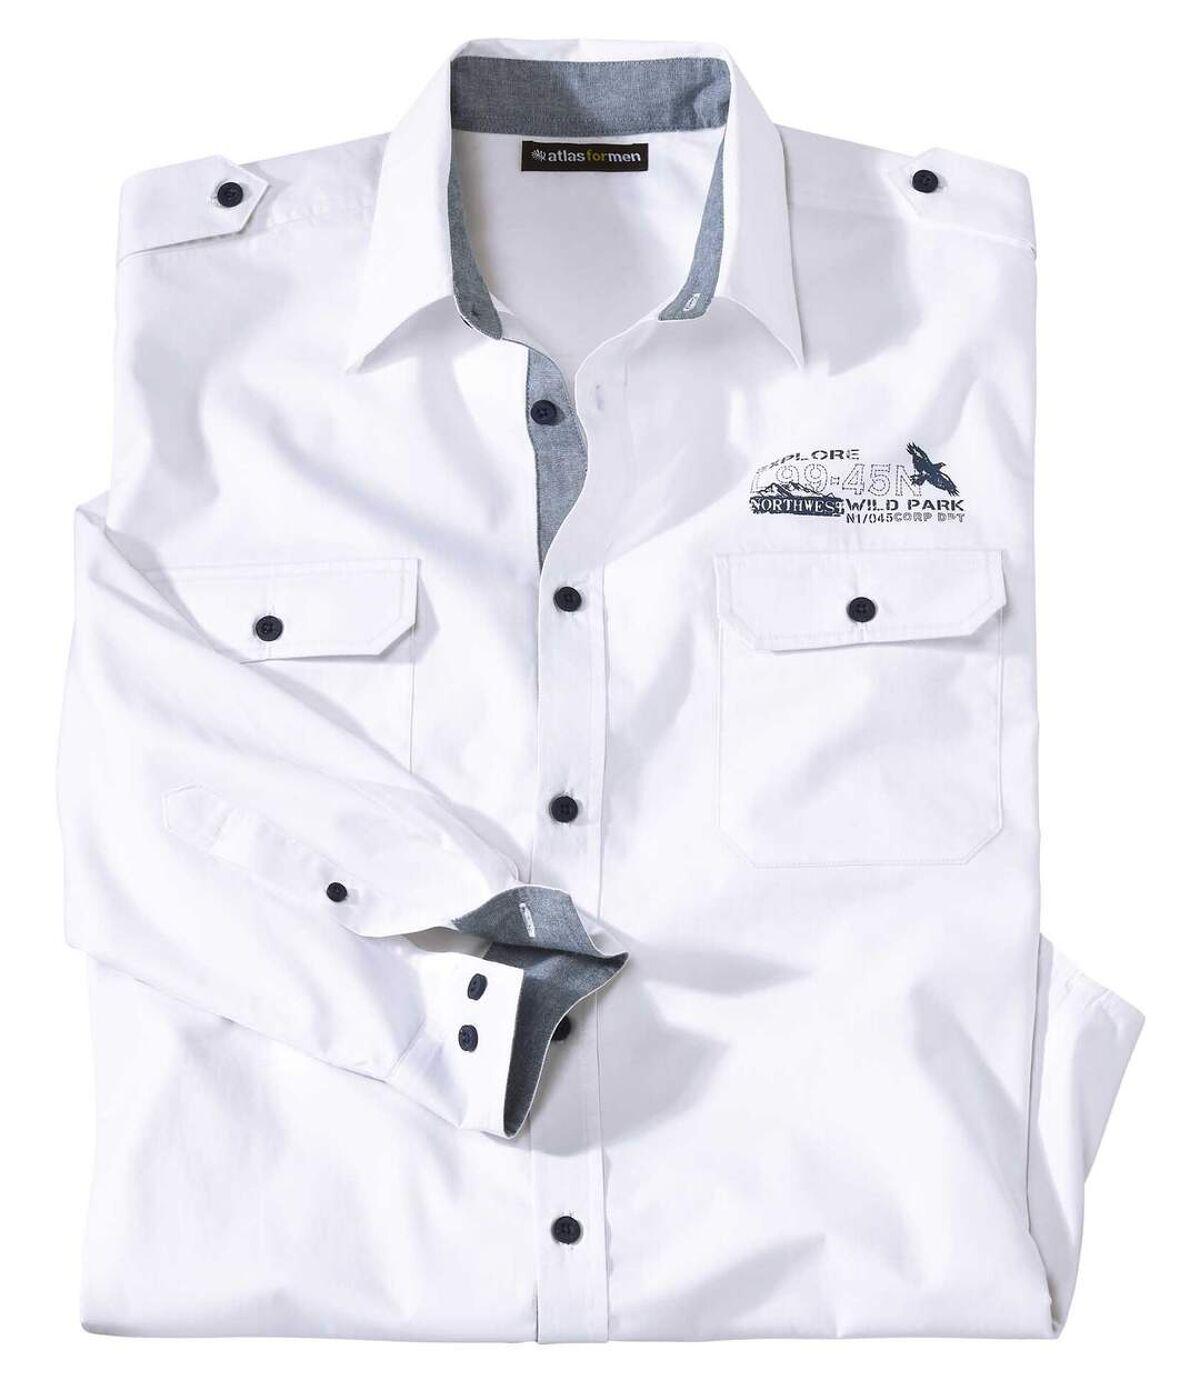 Biała popelinowa koszula Explorer Atlas For Men